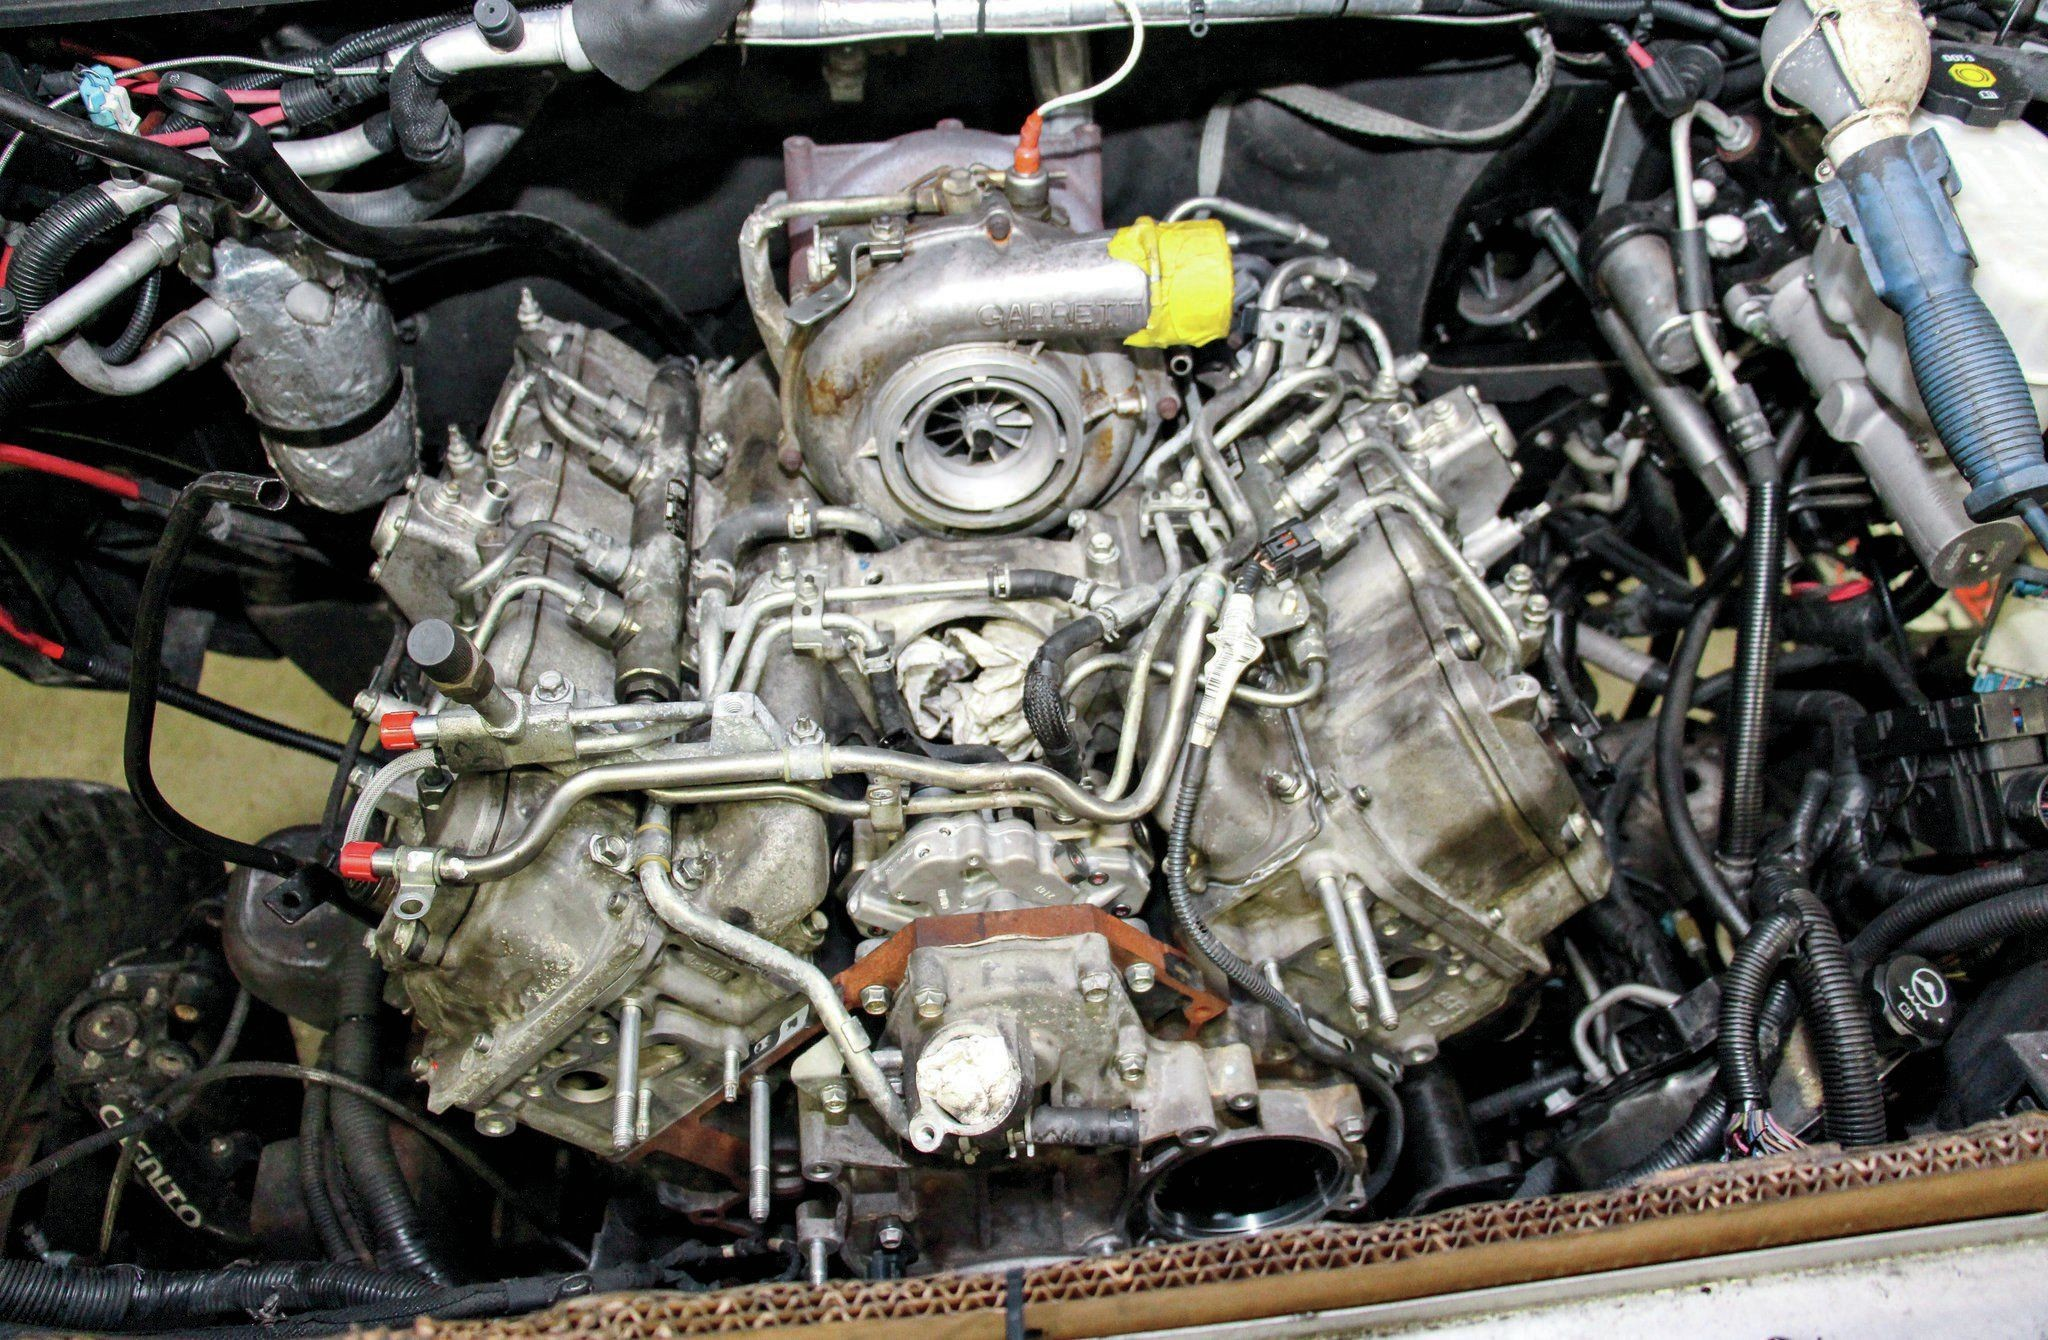 Duramax Diesel Engine Diagram Adding 200 Horsepower to A Potent Lmm Duramax Diesel & Image Of Duramax Diesel Engine Diagram